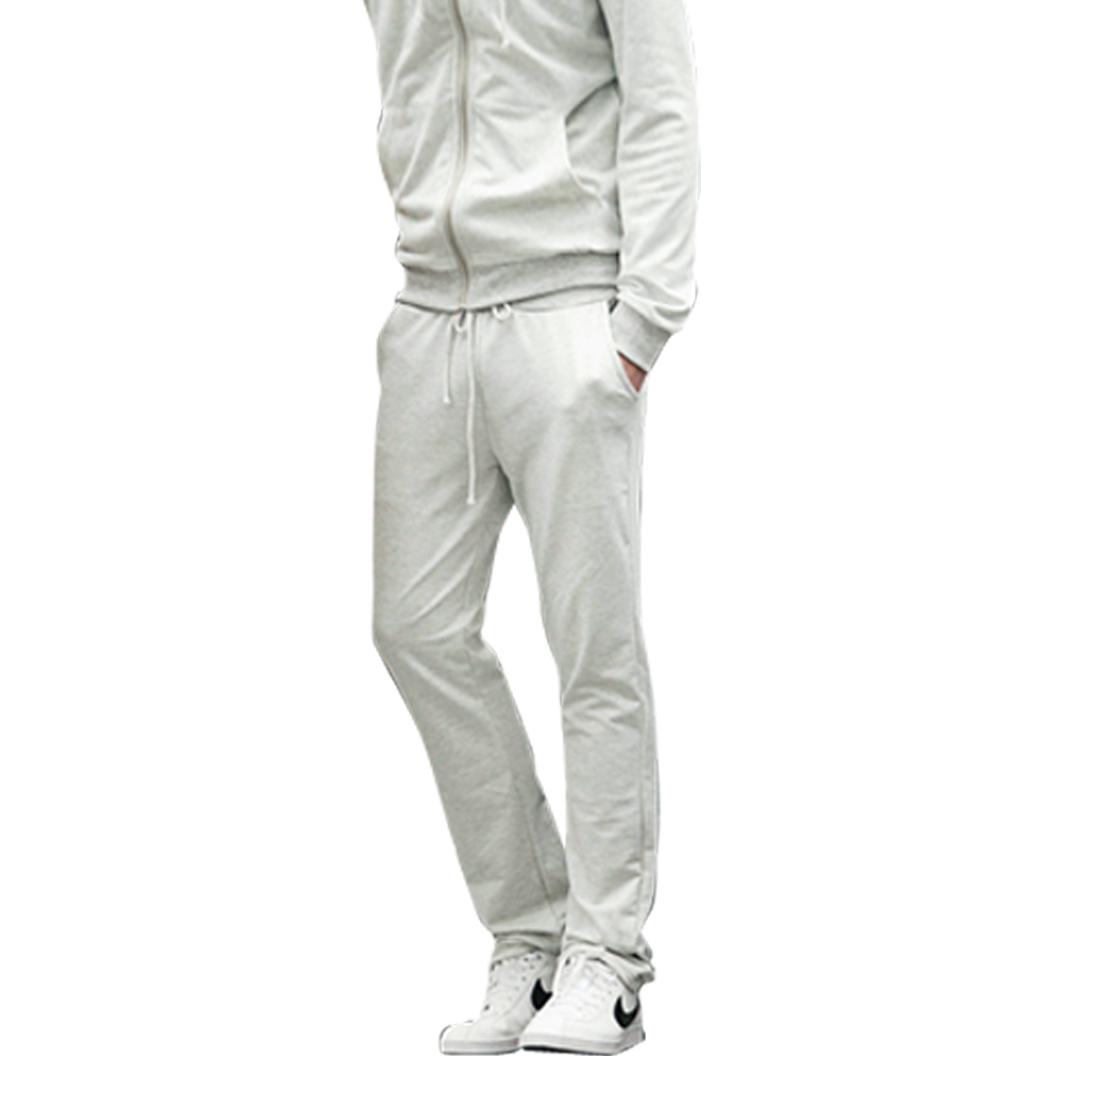 Men Elastic Waist Spring Wearing Pants Light Gray W30